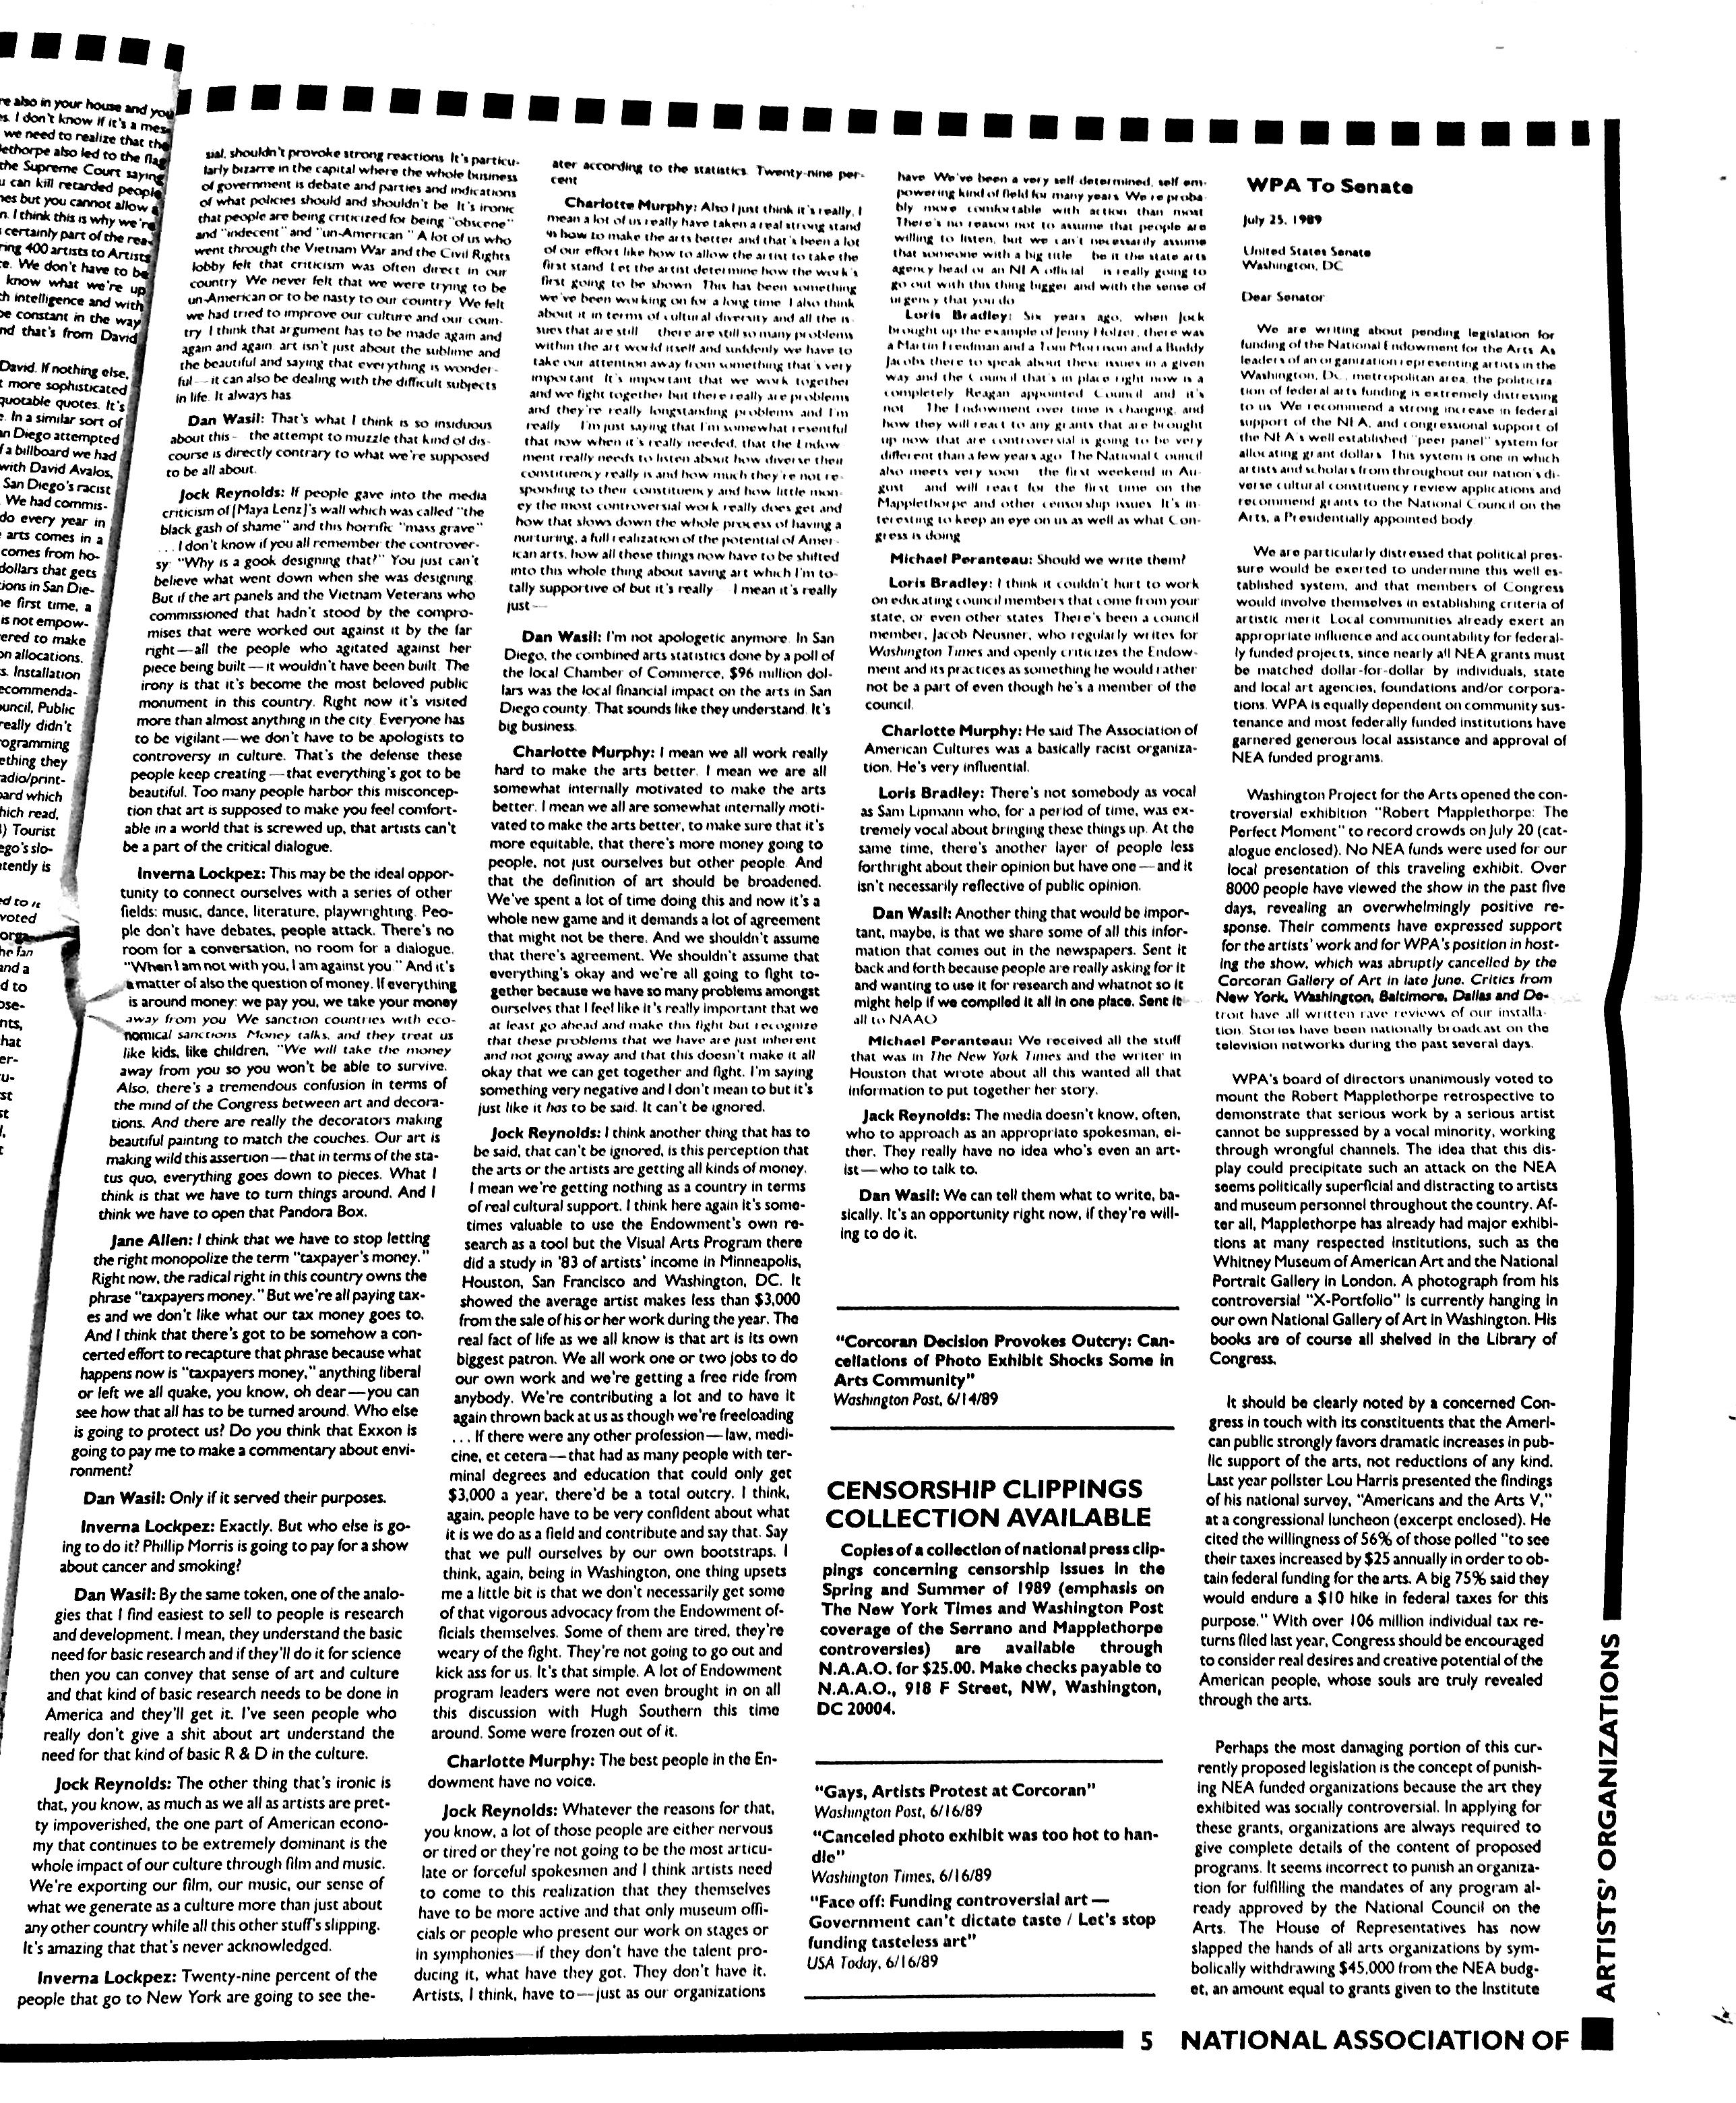 August 1989 - NAAO Bulletin Page 6.jpg